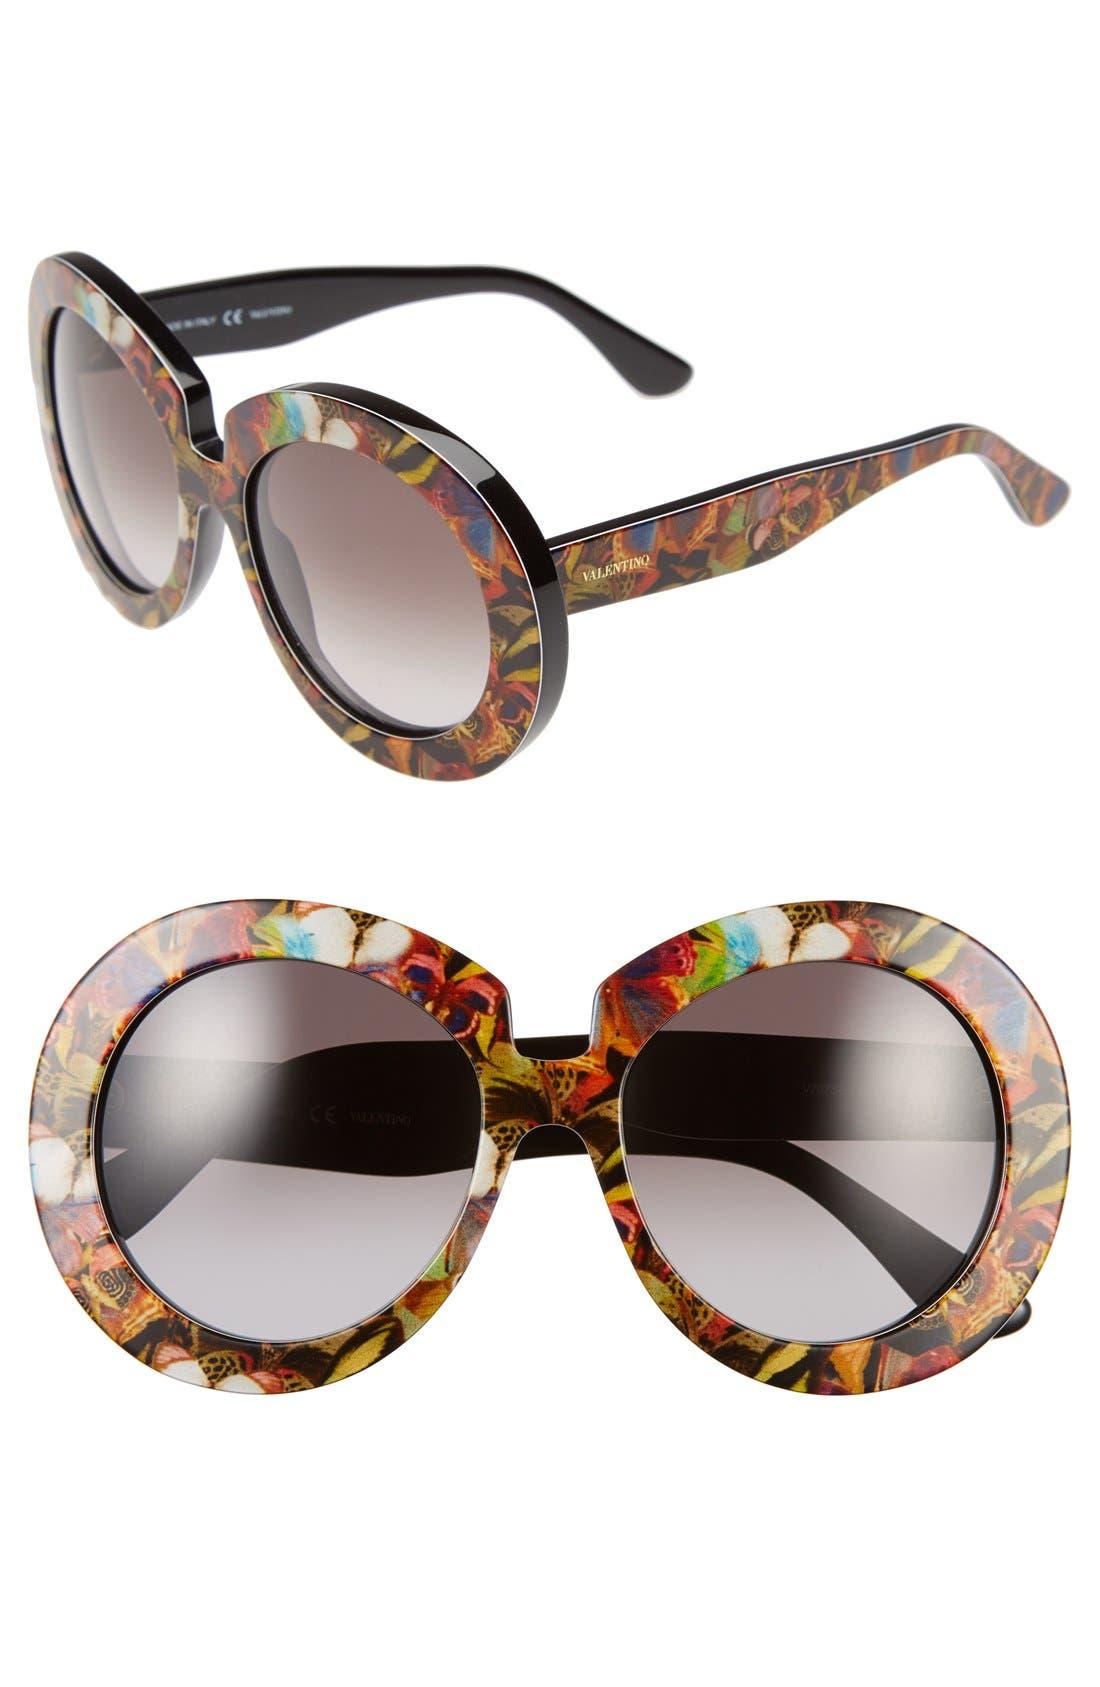 Alternate Image 1 Selected - Valentino 54mm Oversized Gradient Sunglasses